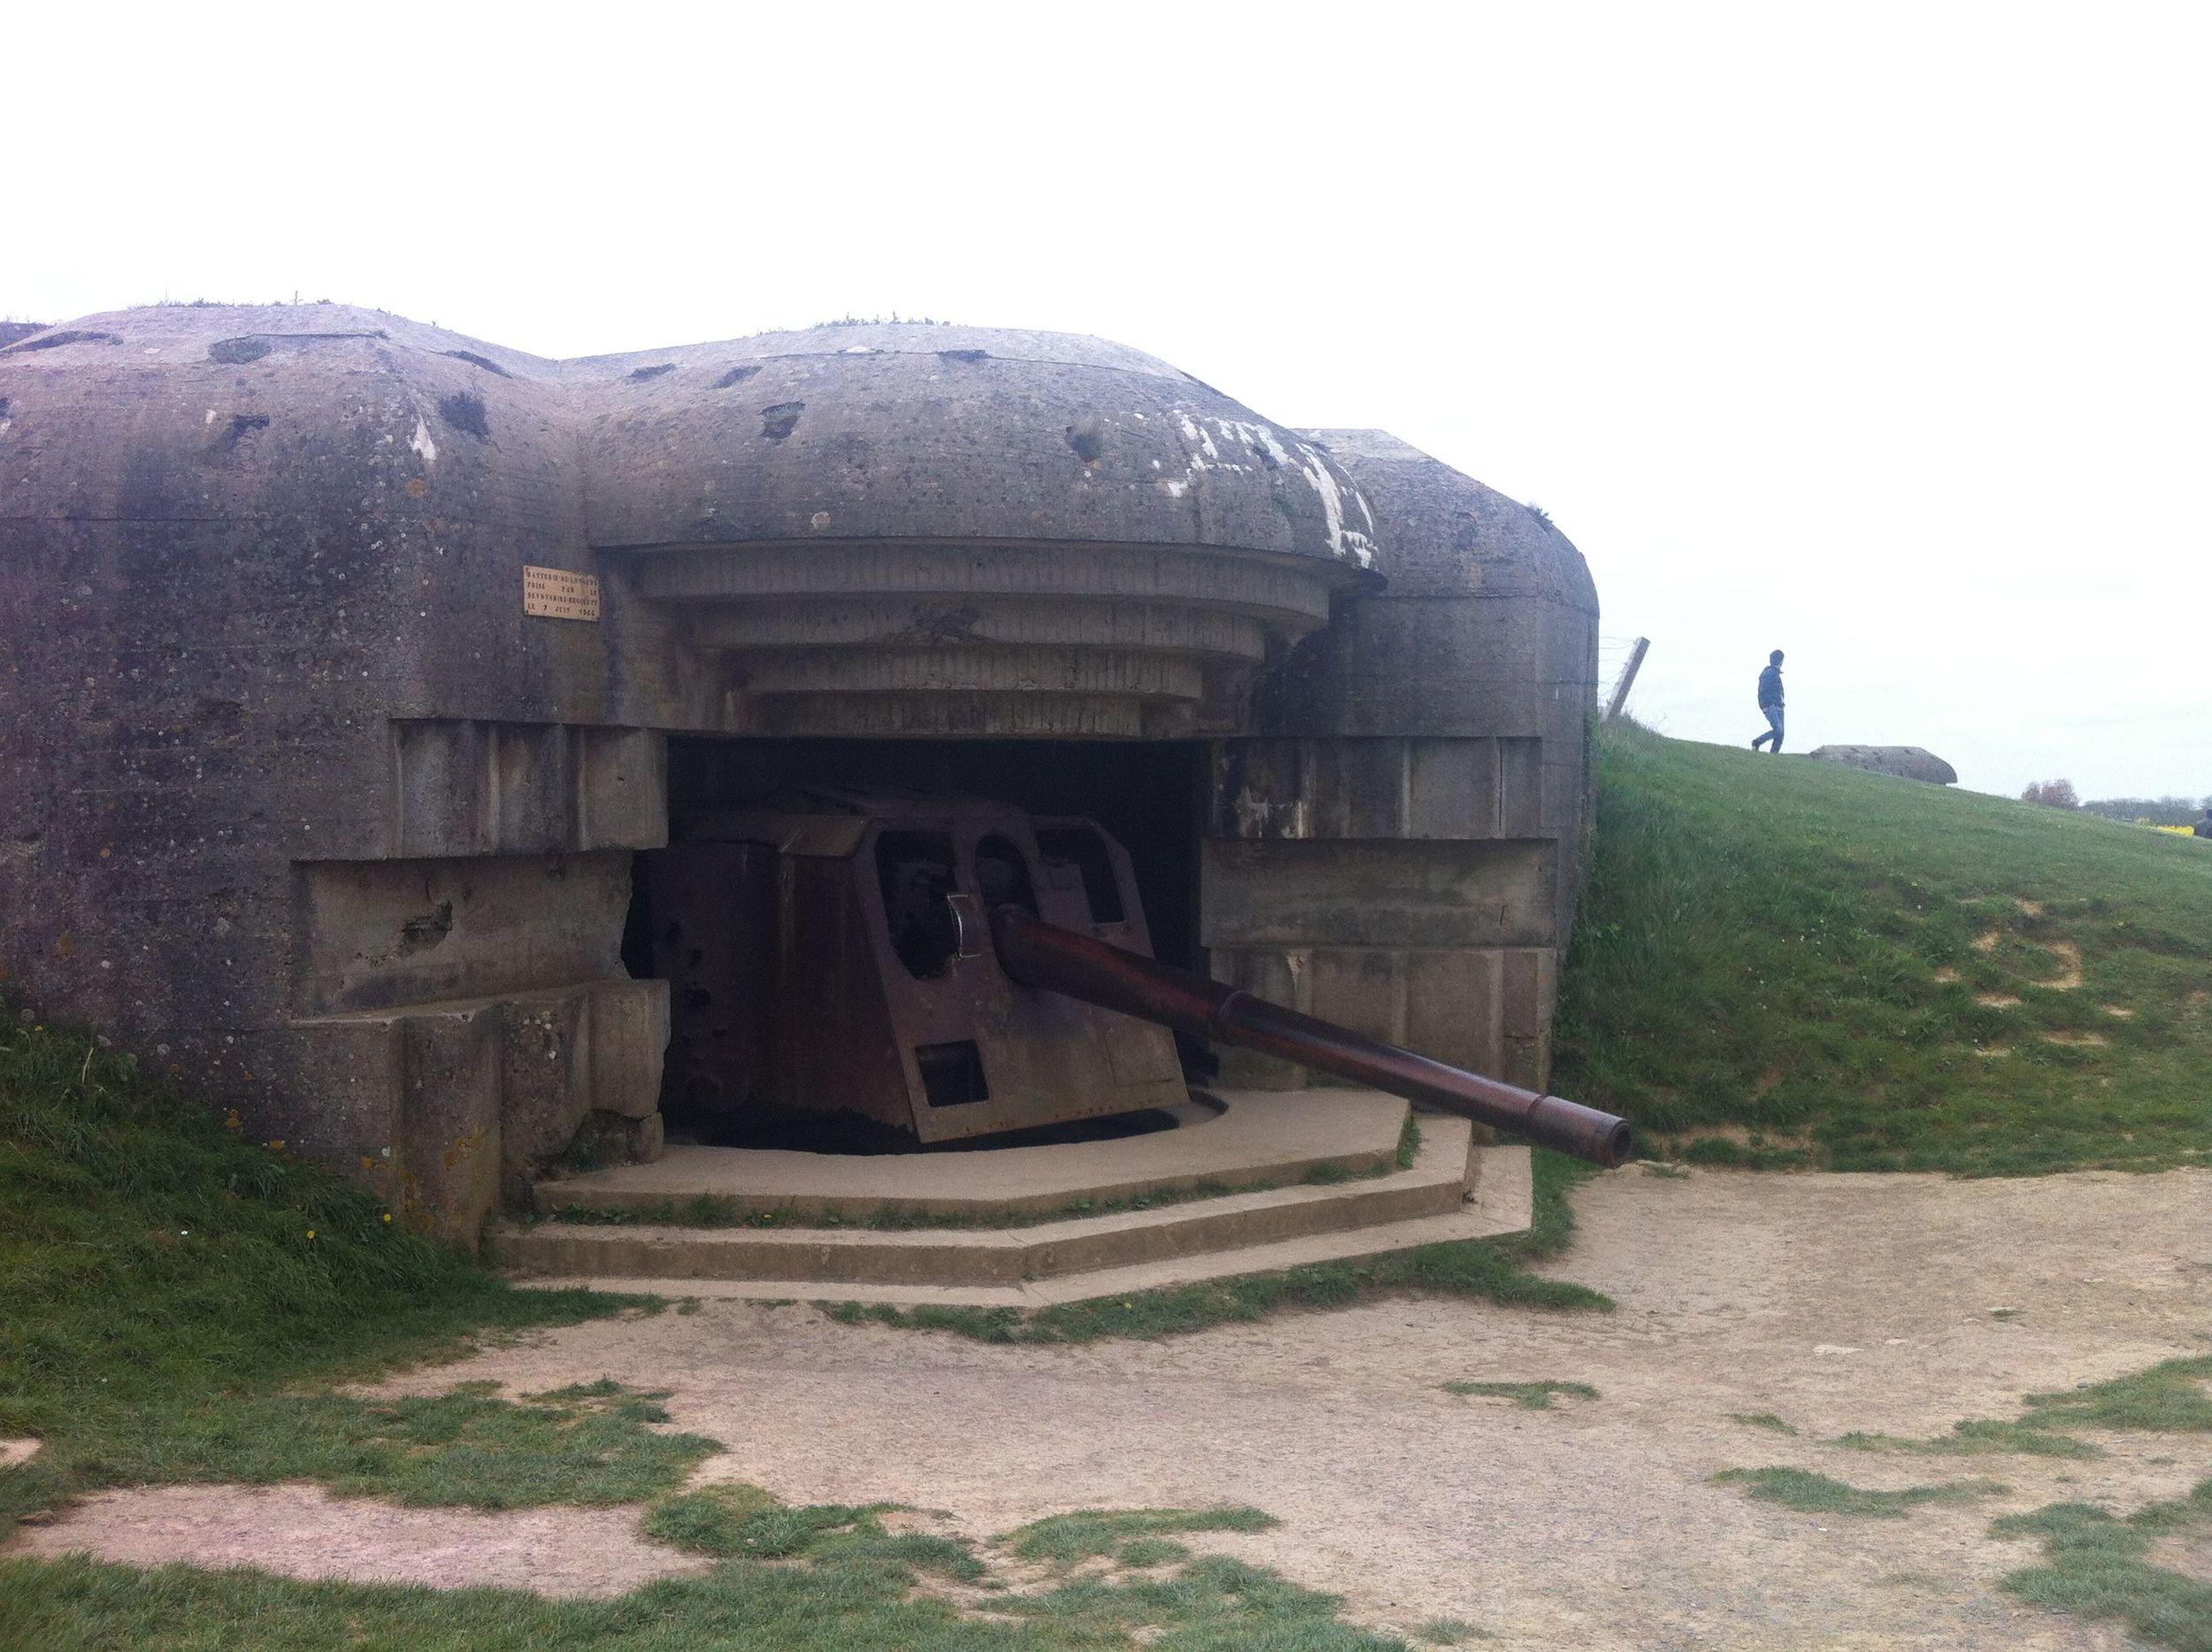 German bunkers near Gold Beach, Normandy.